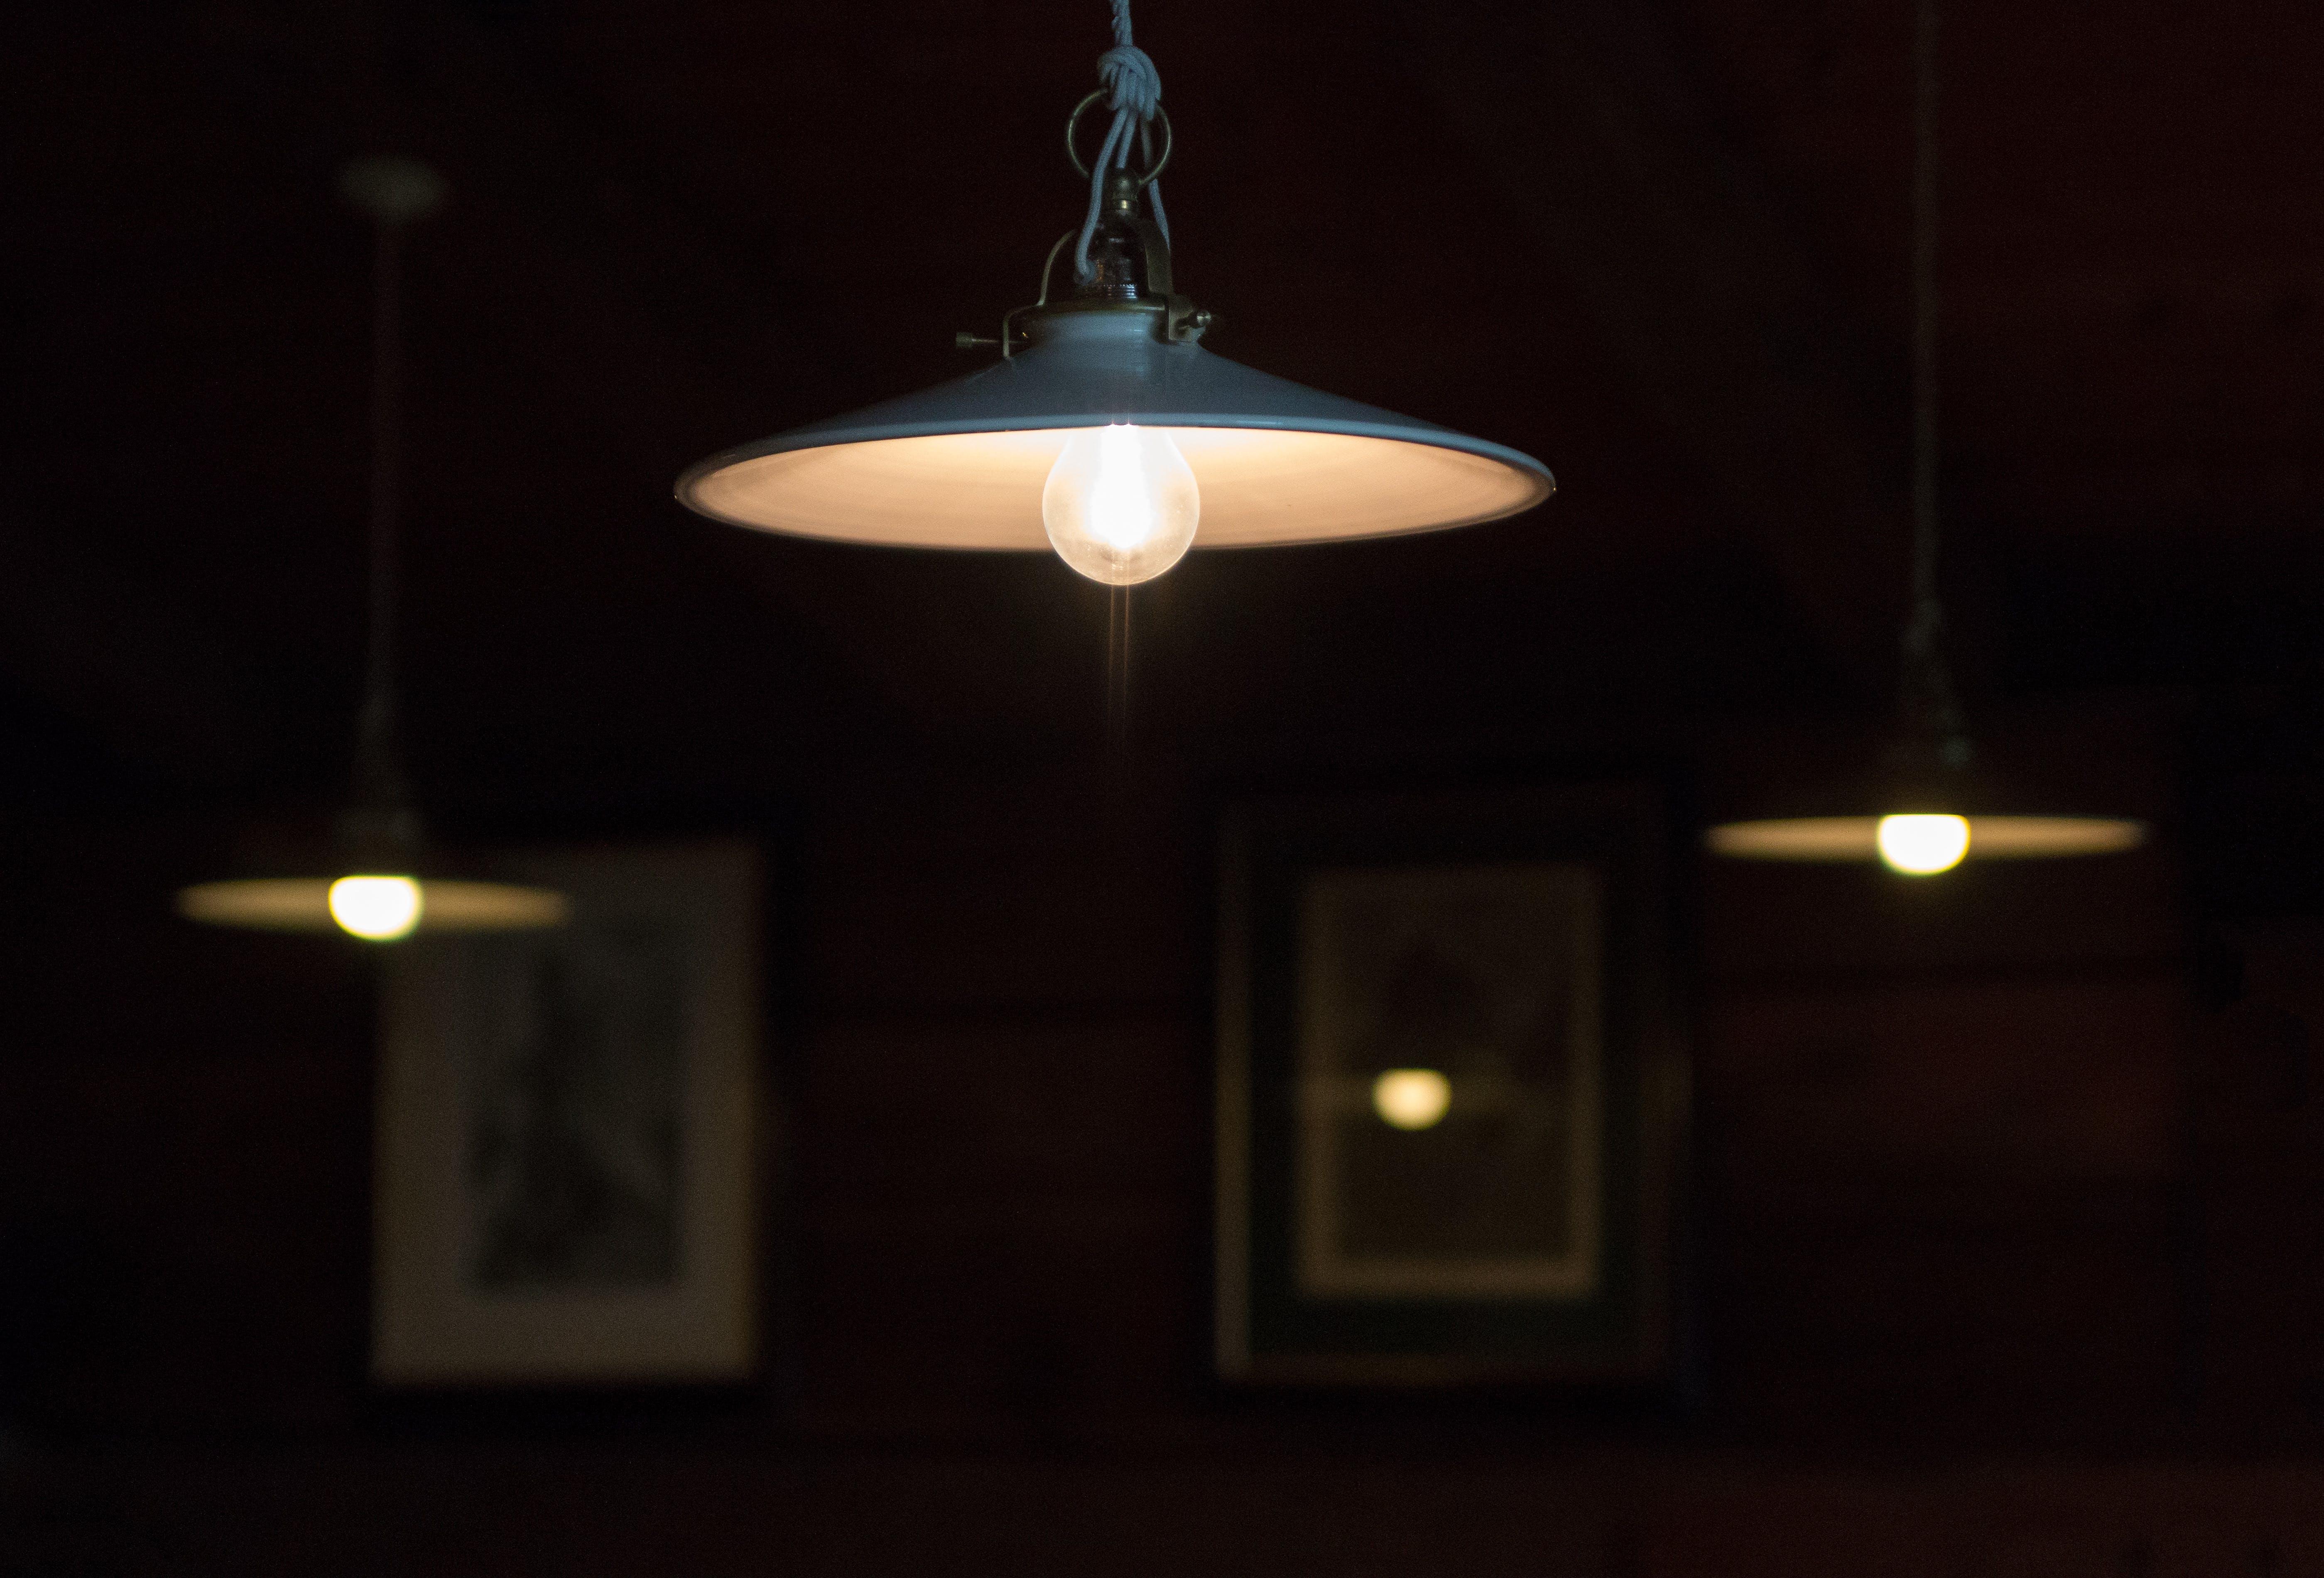 blur, bulbs, decoration